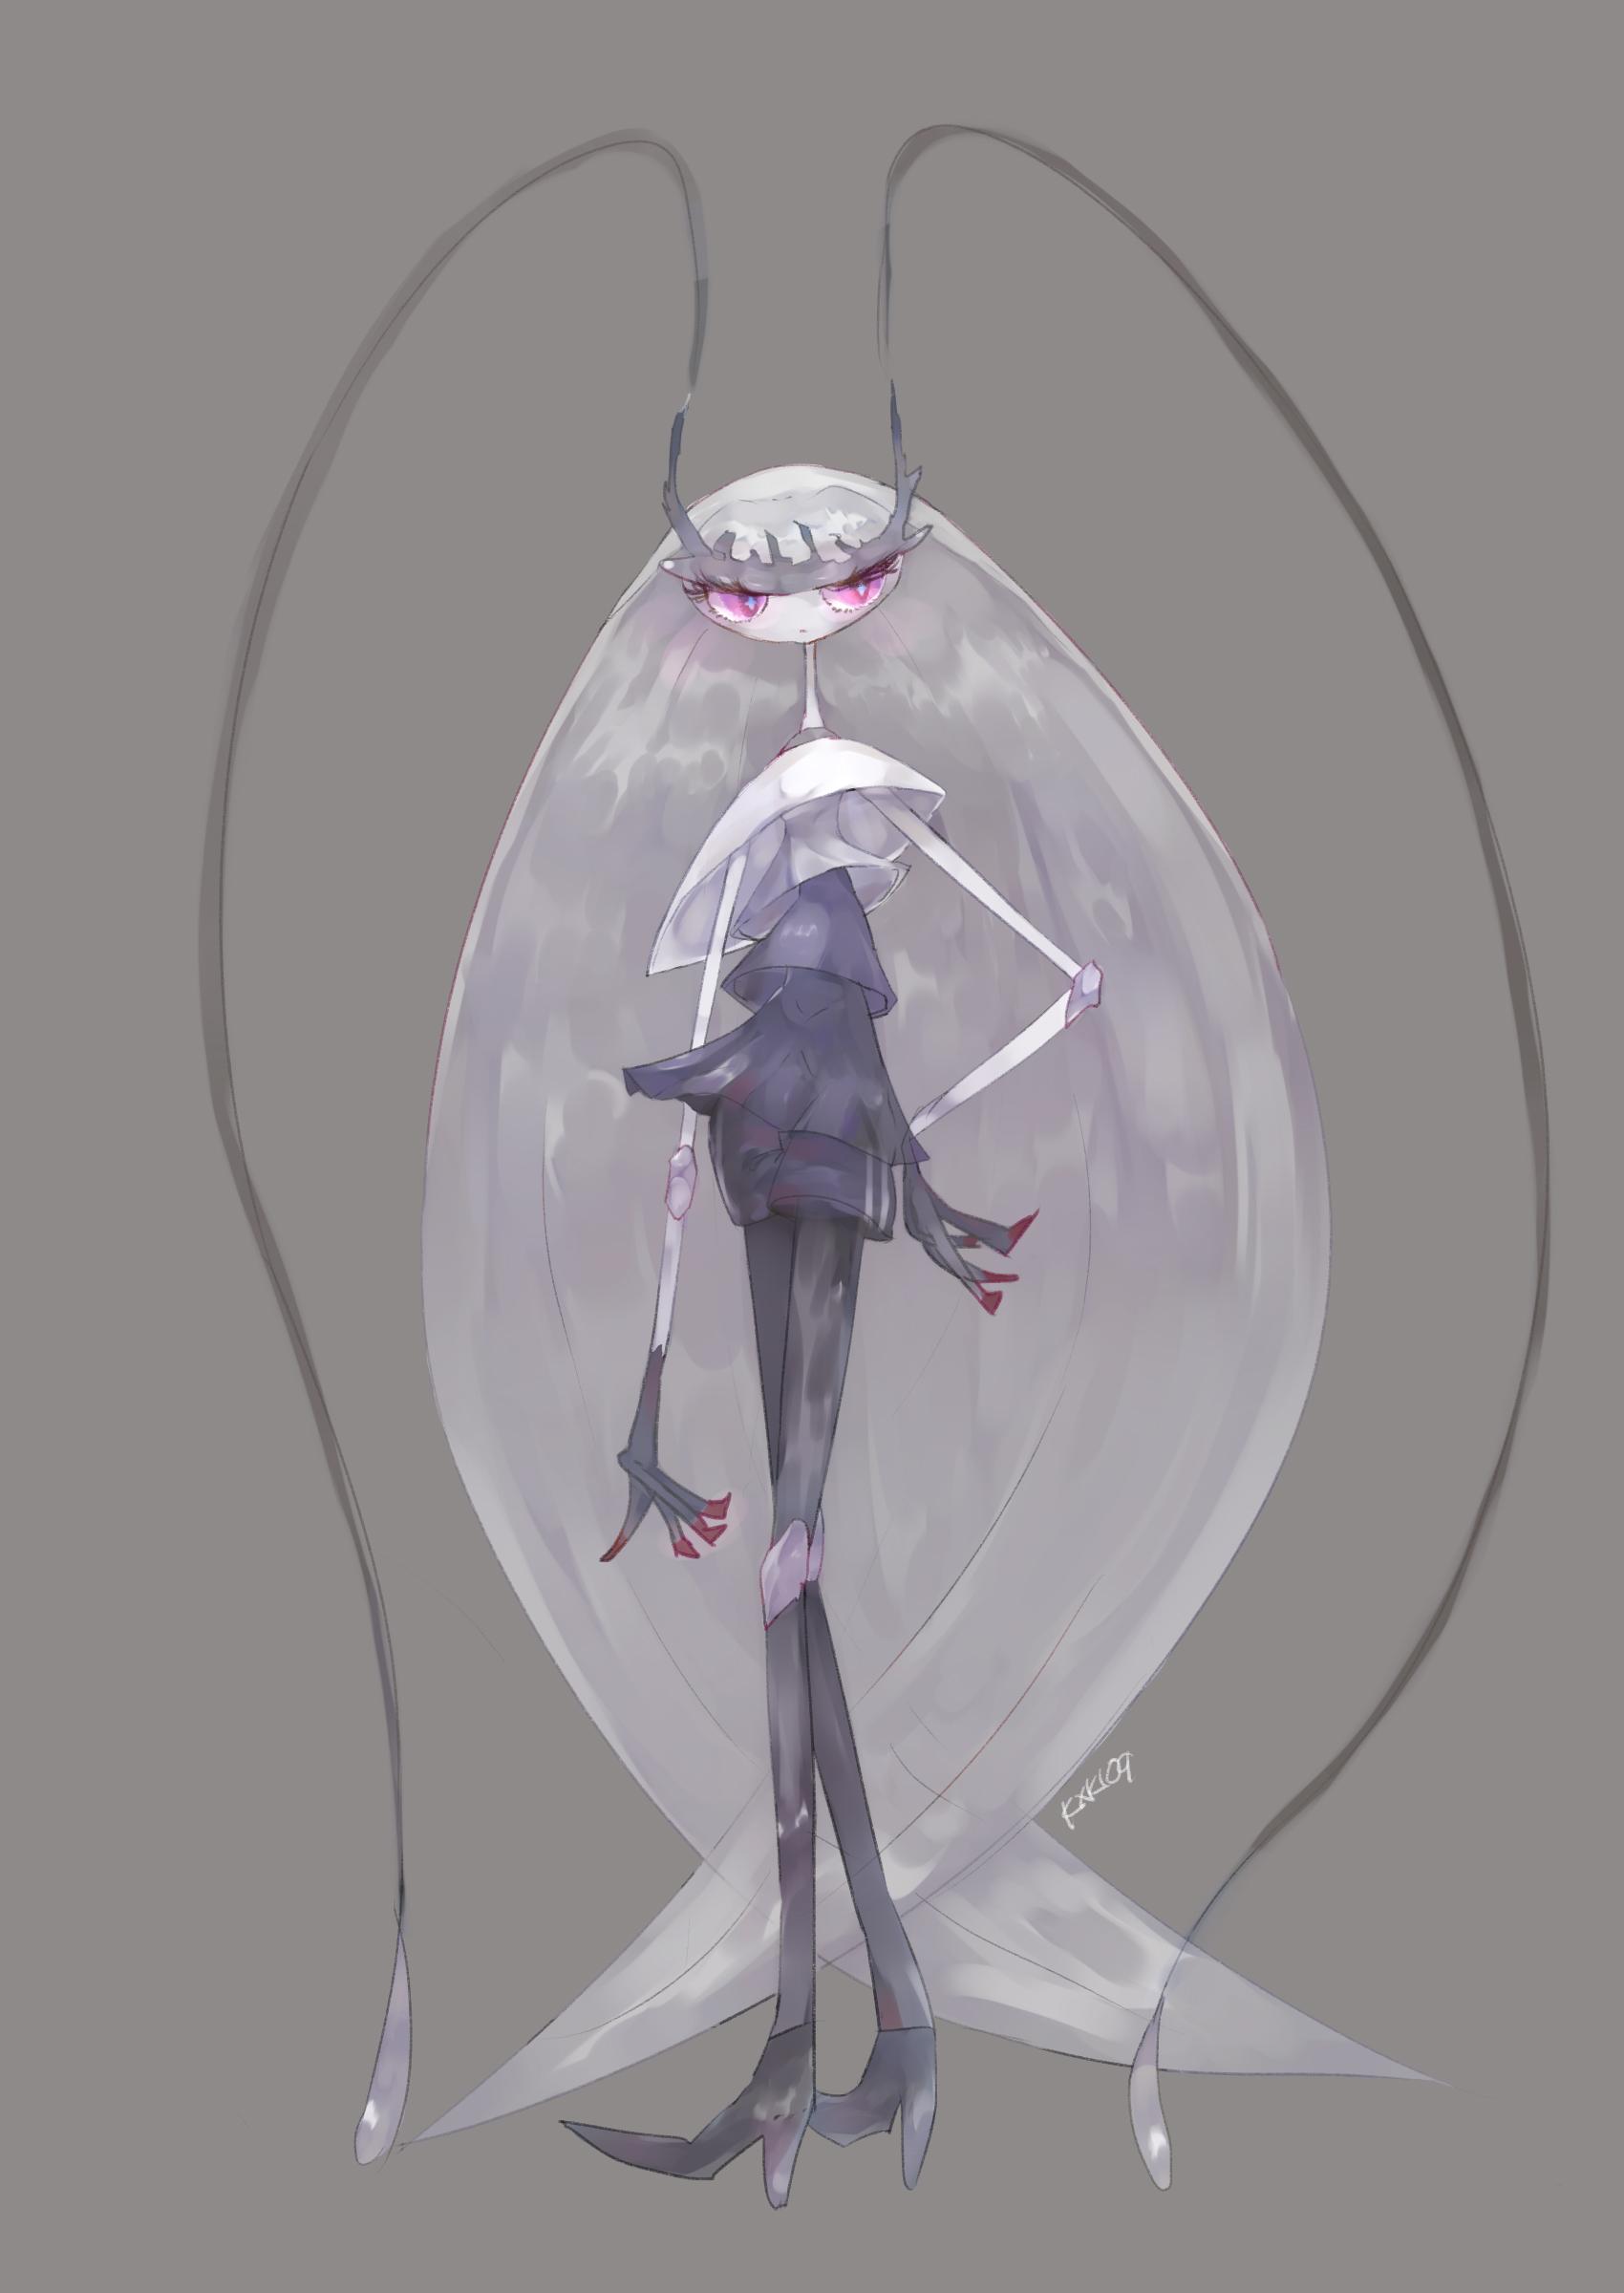 Pheromosa Pok 233 Mon Image 2165564 Zerochan Anime Image Board